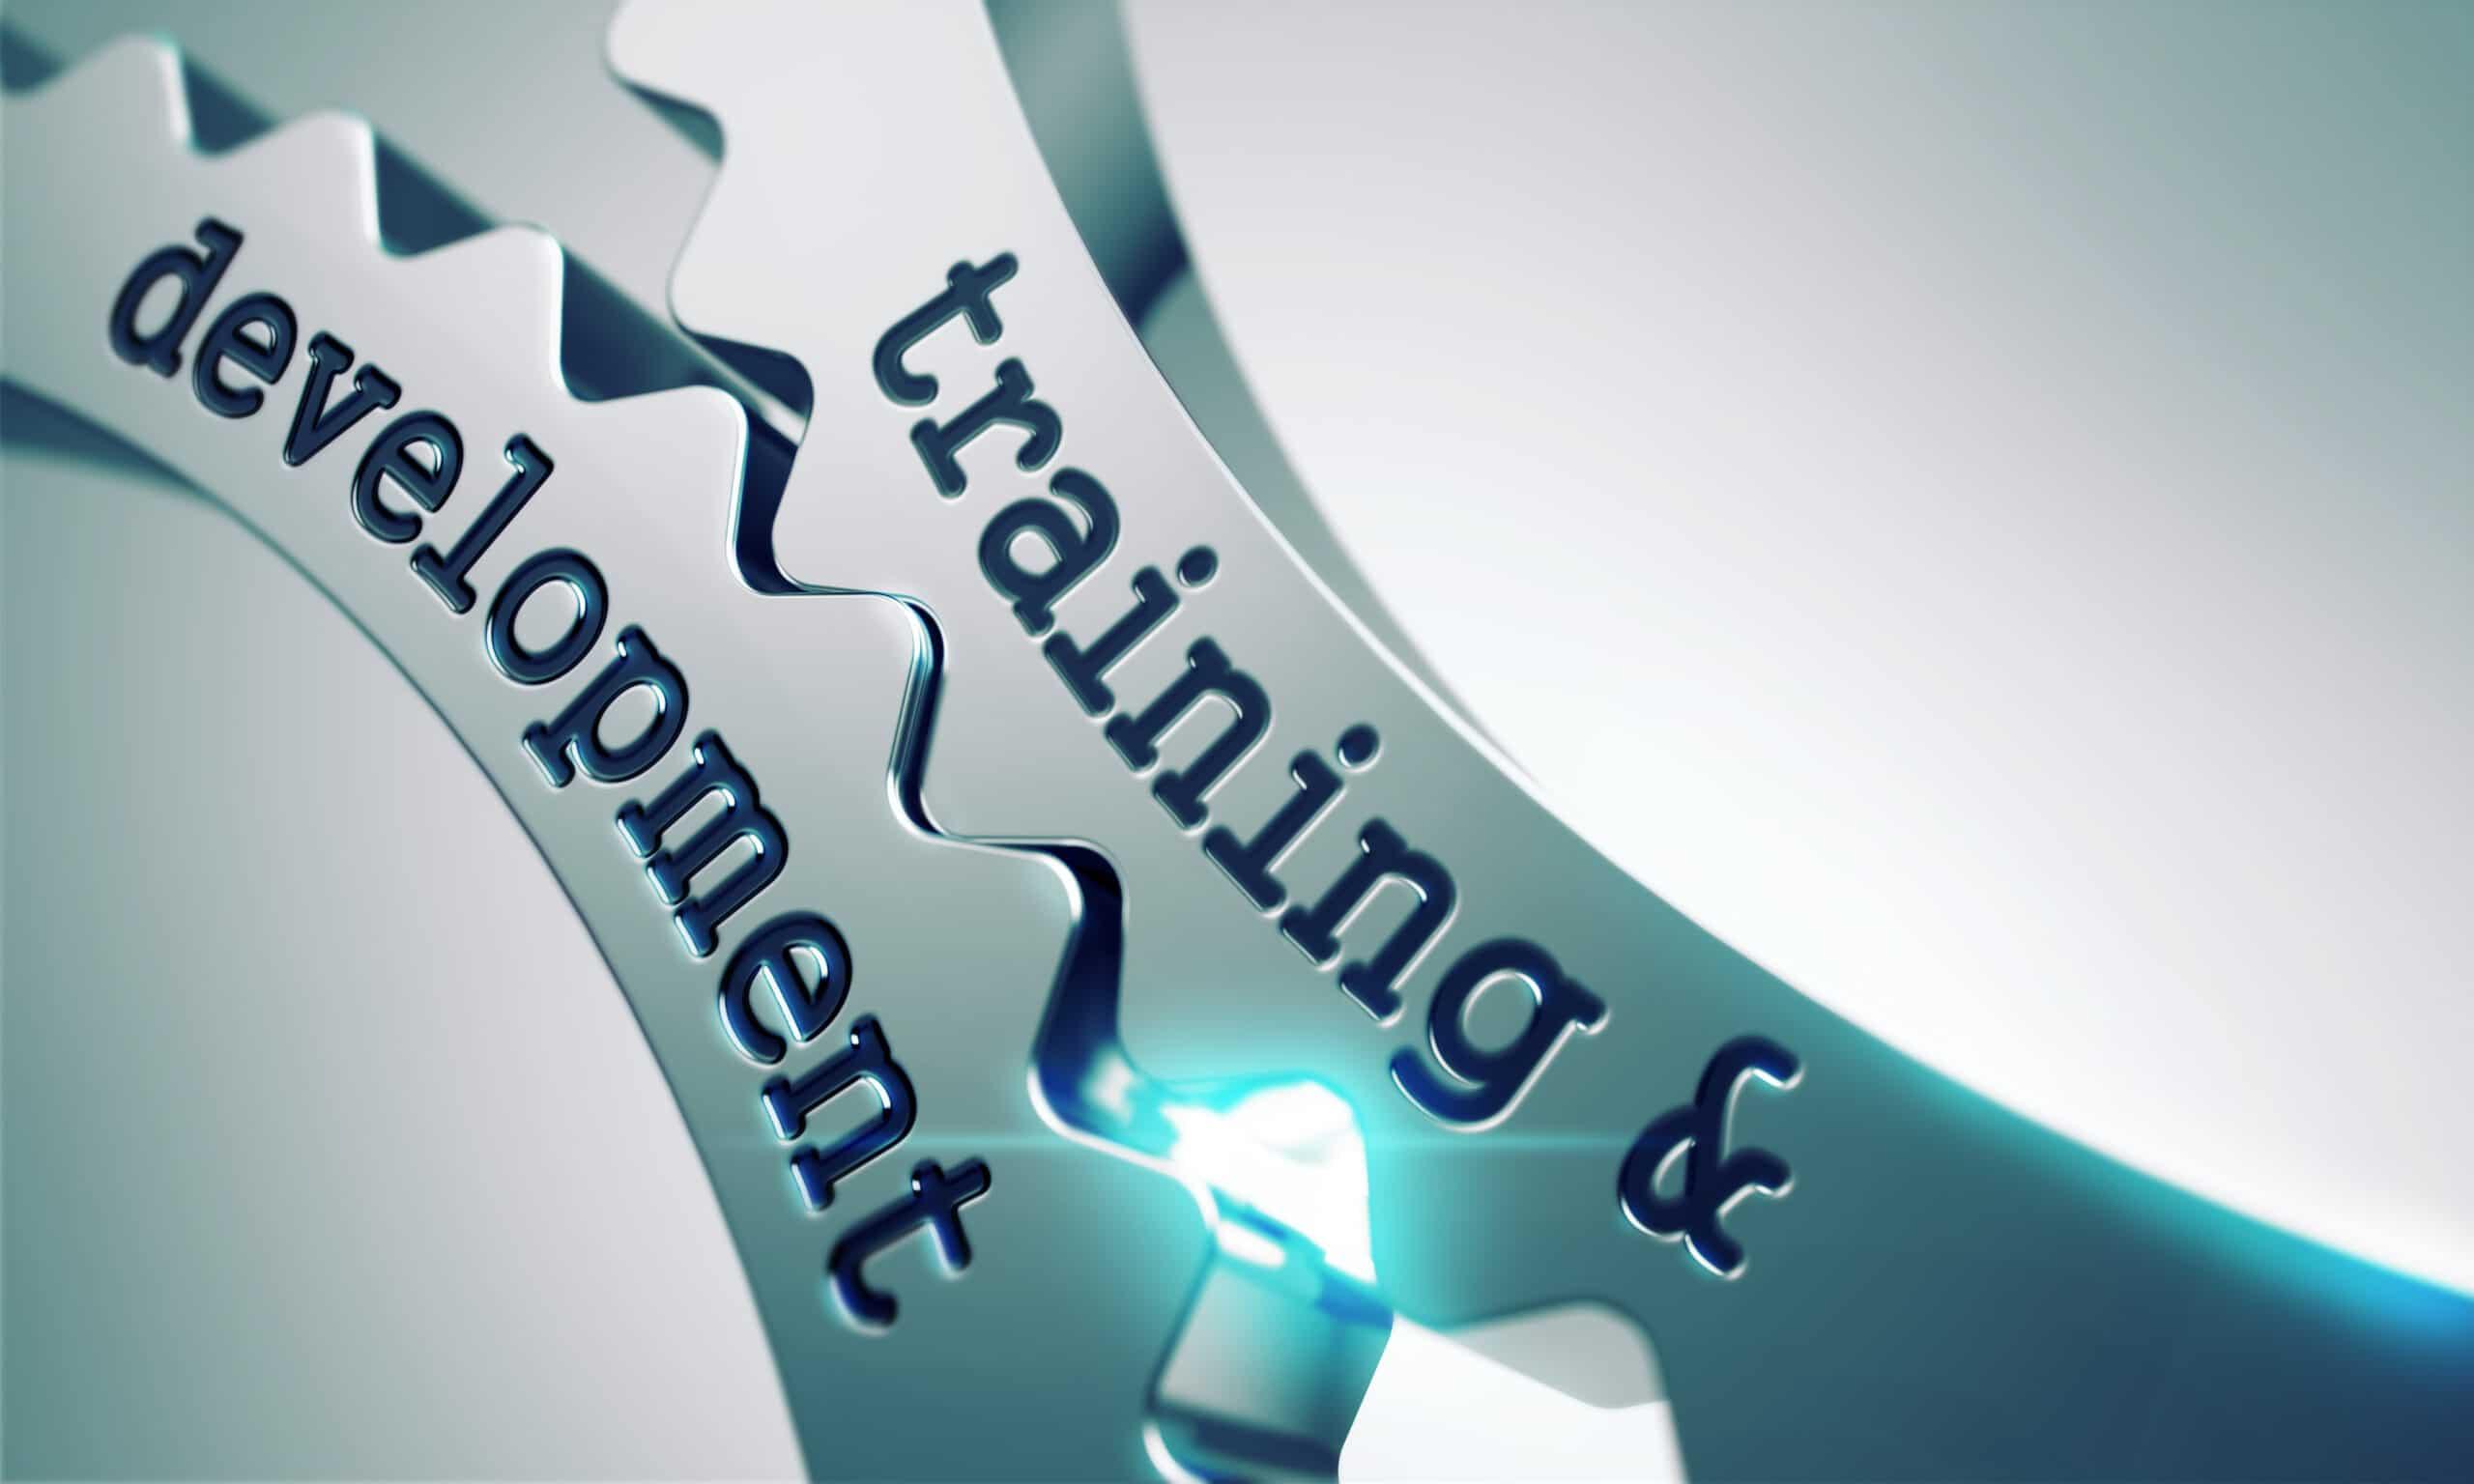 Training, training, training